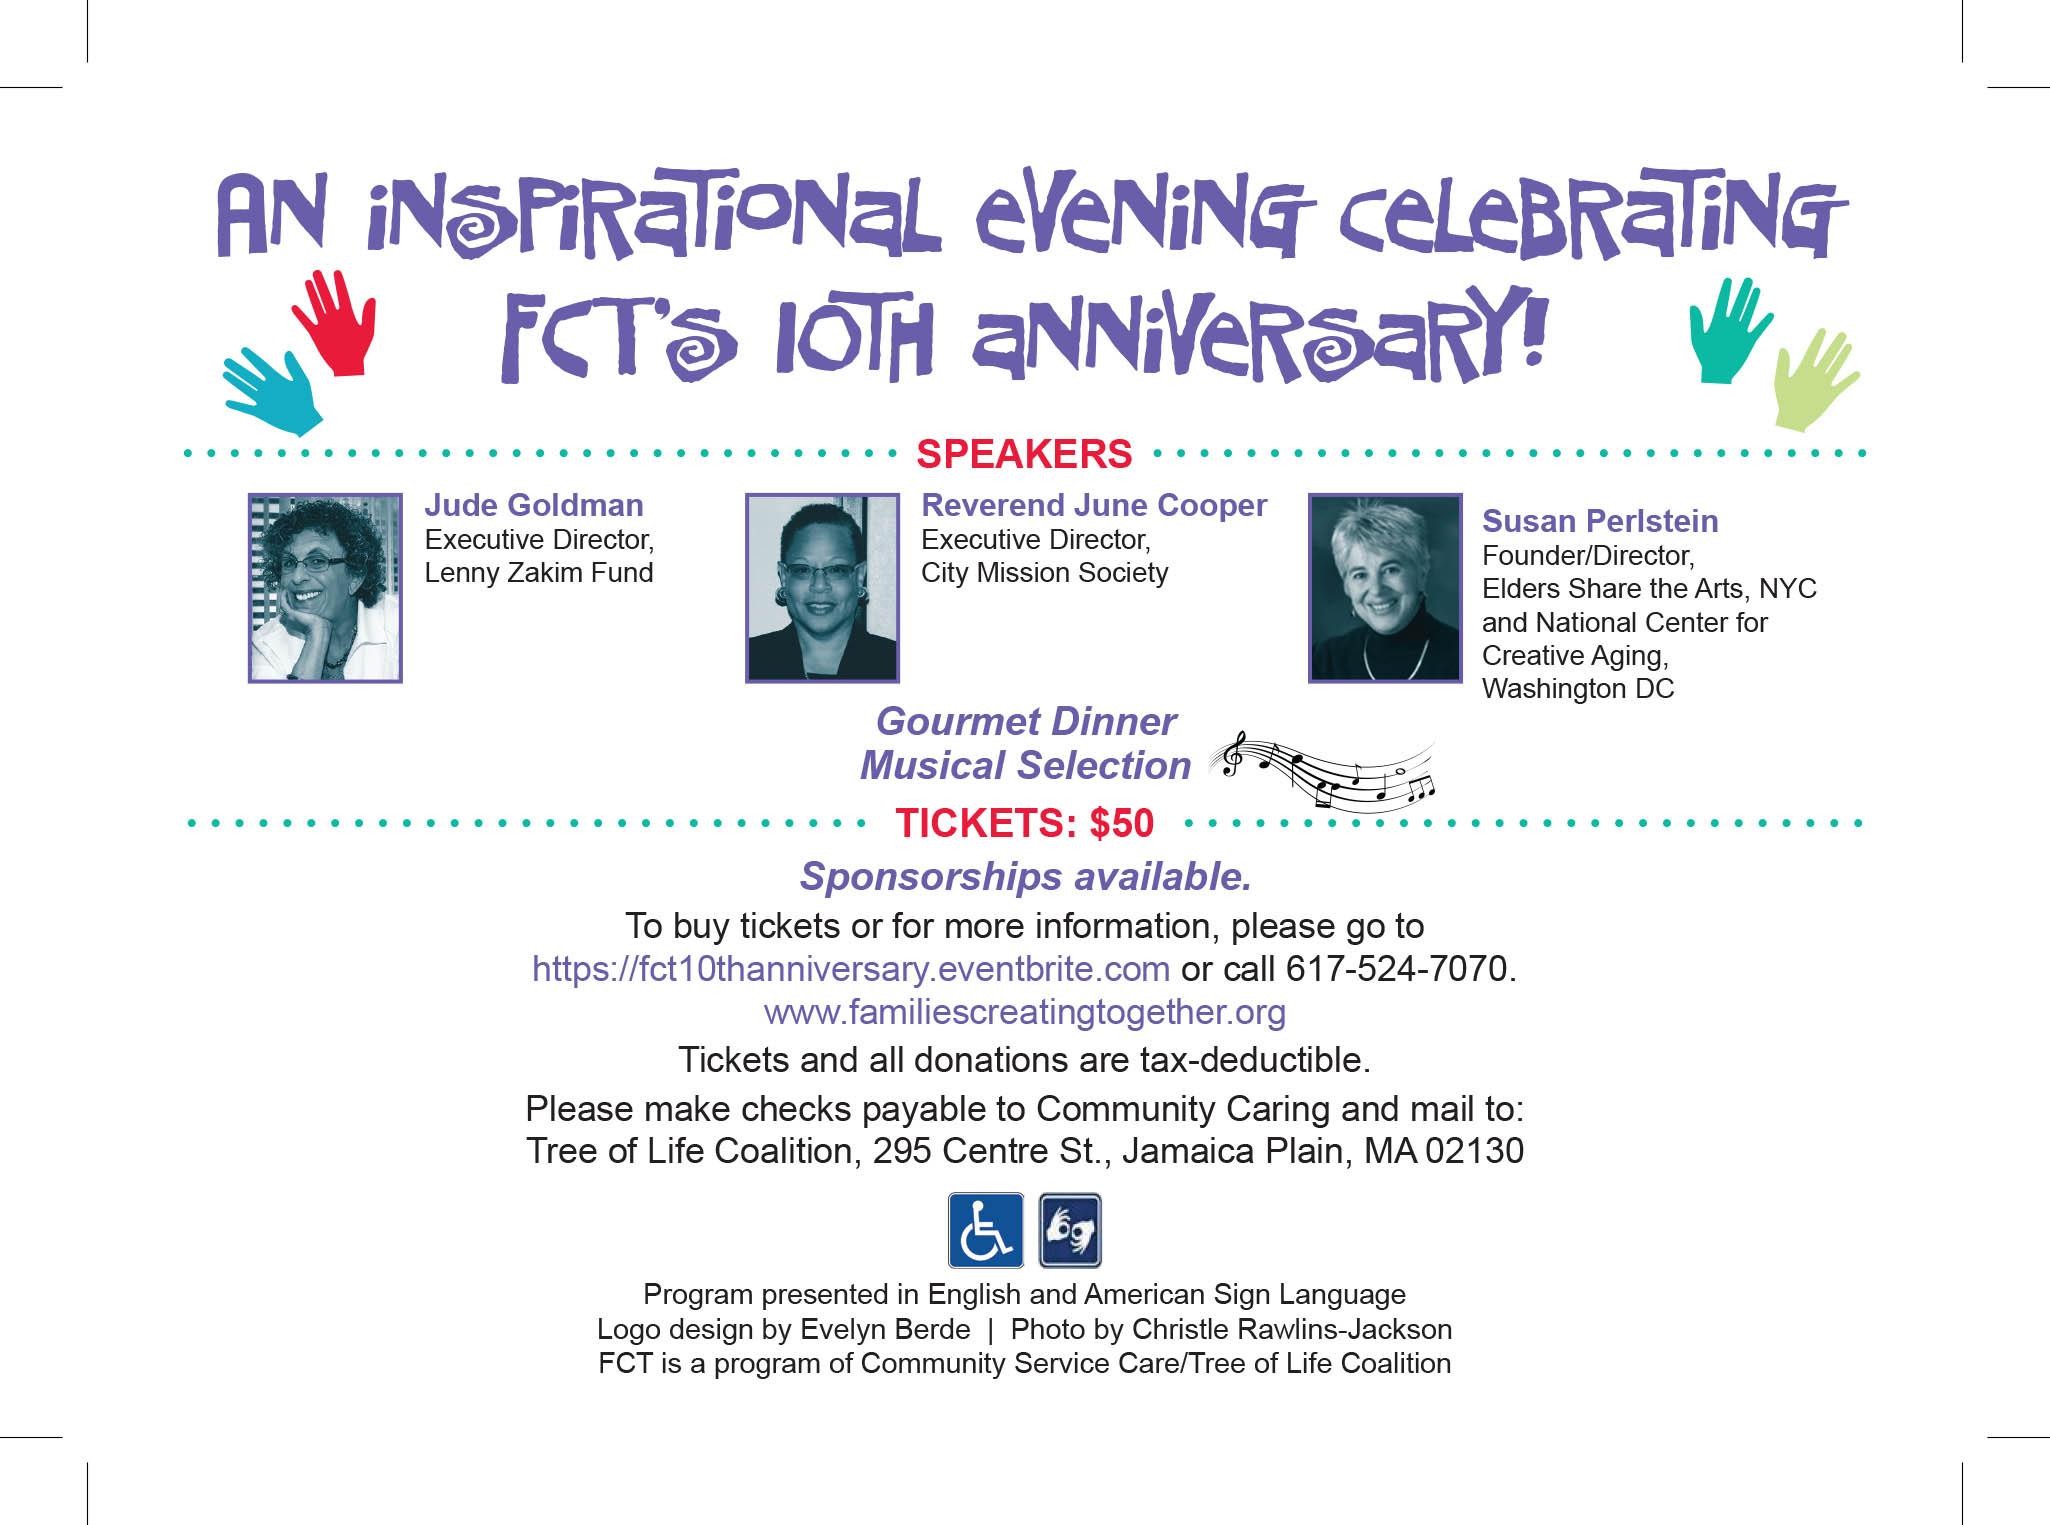 FCT invitation-4print-2.jpg